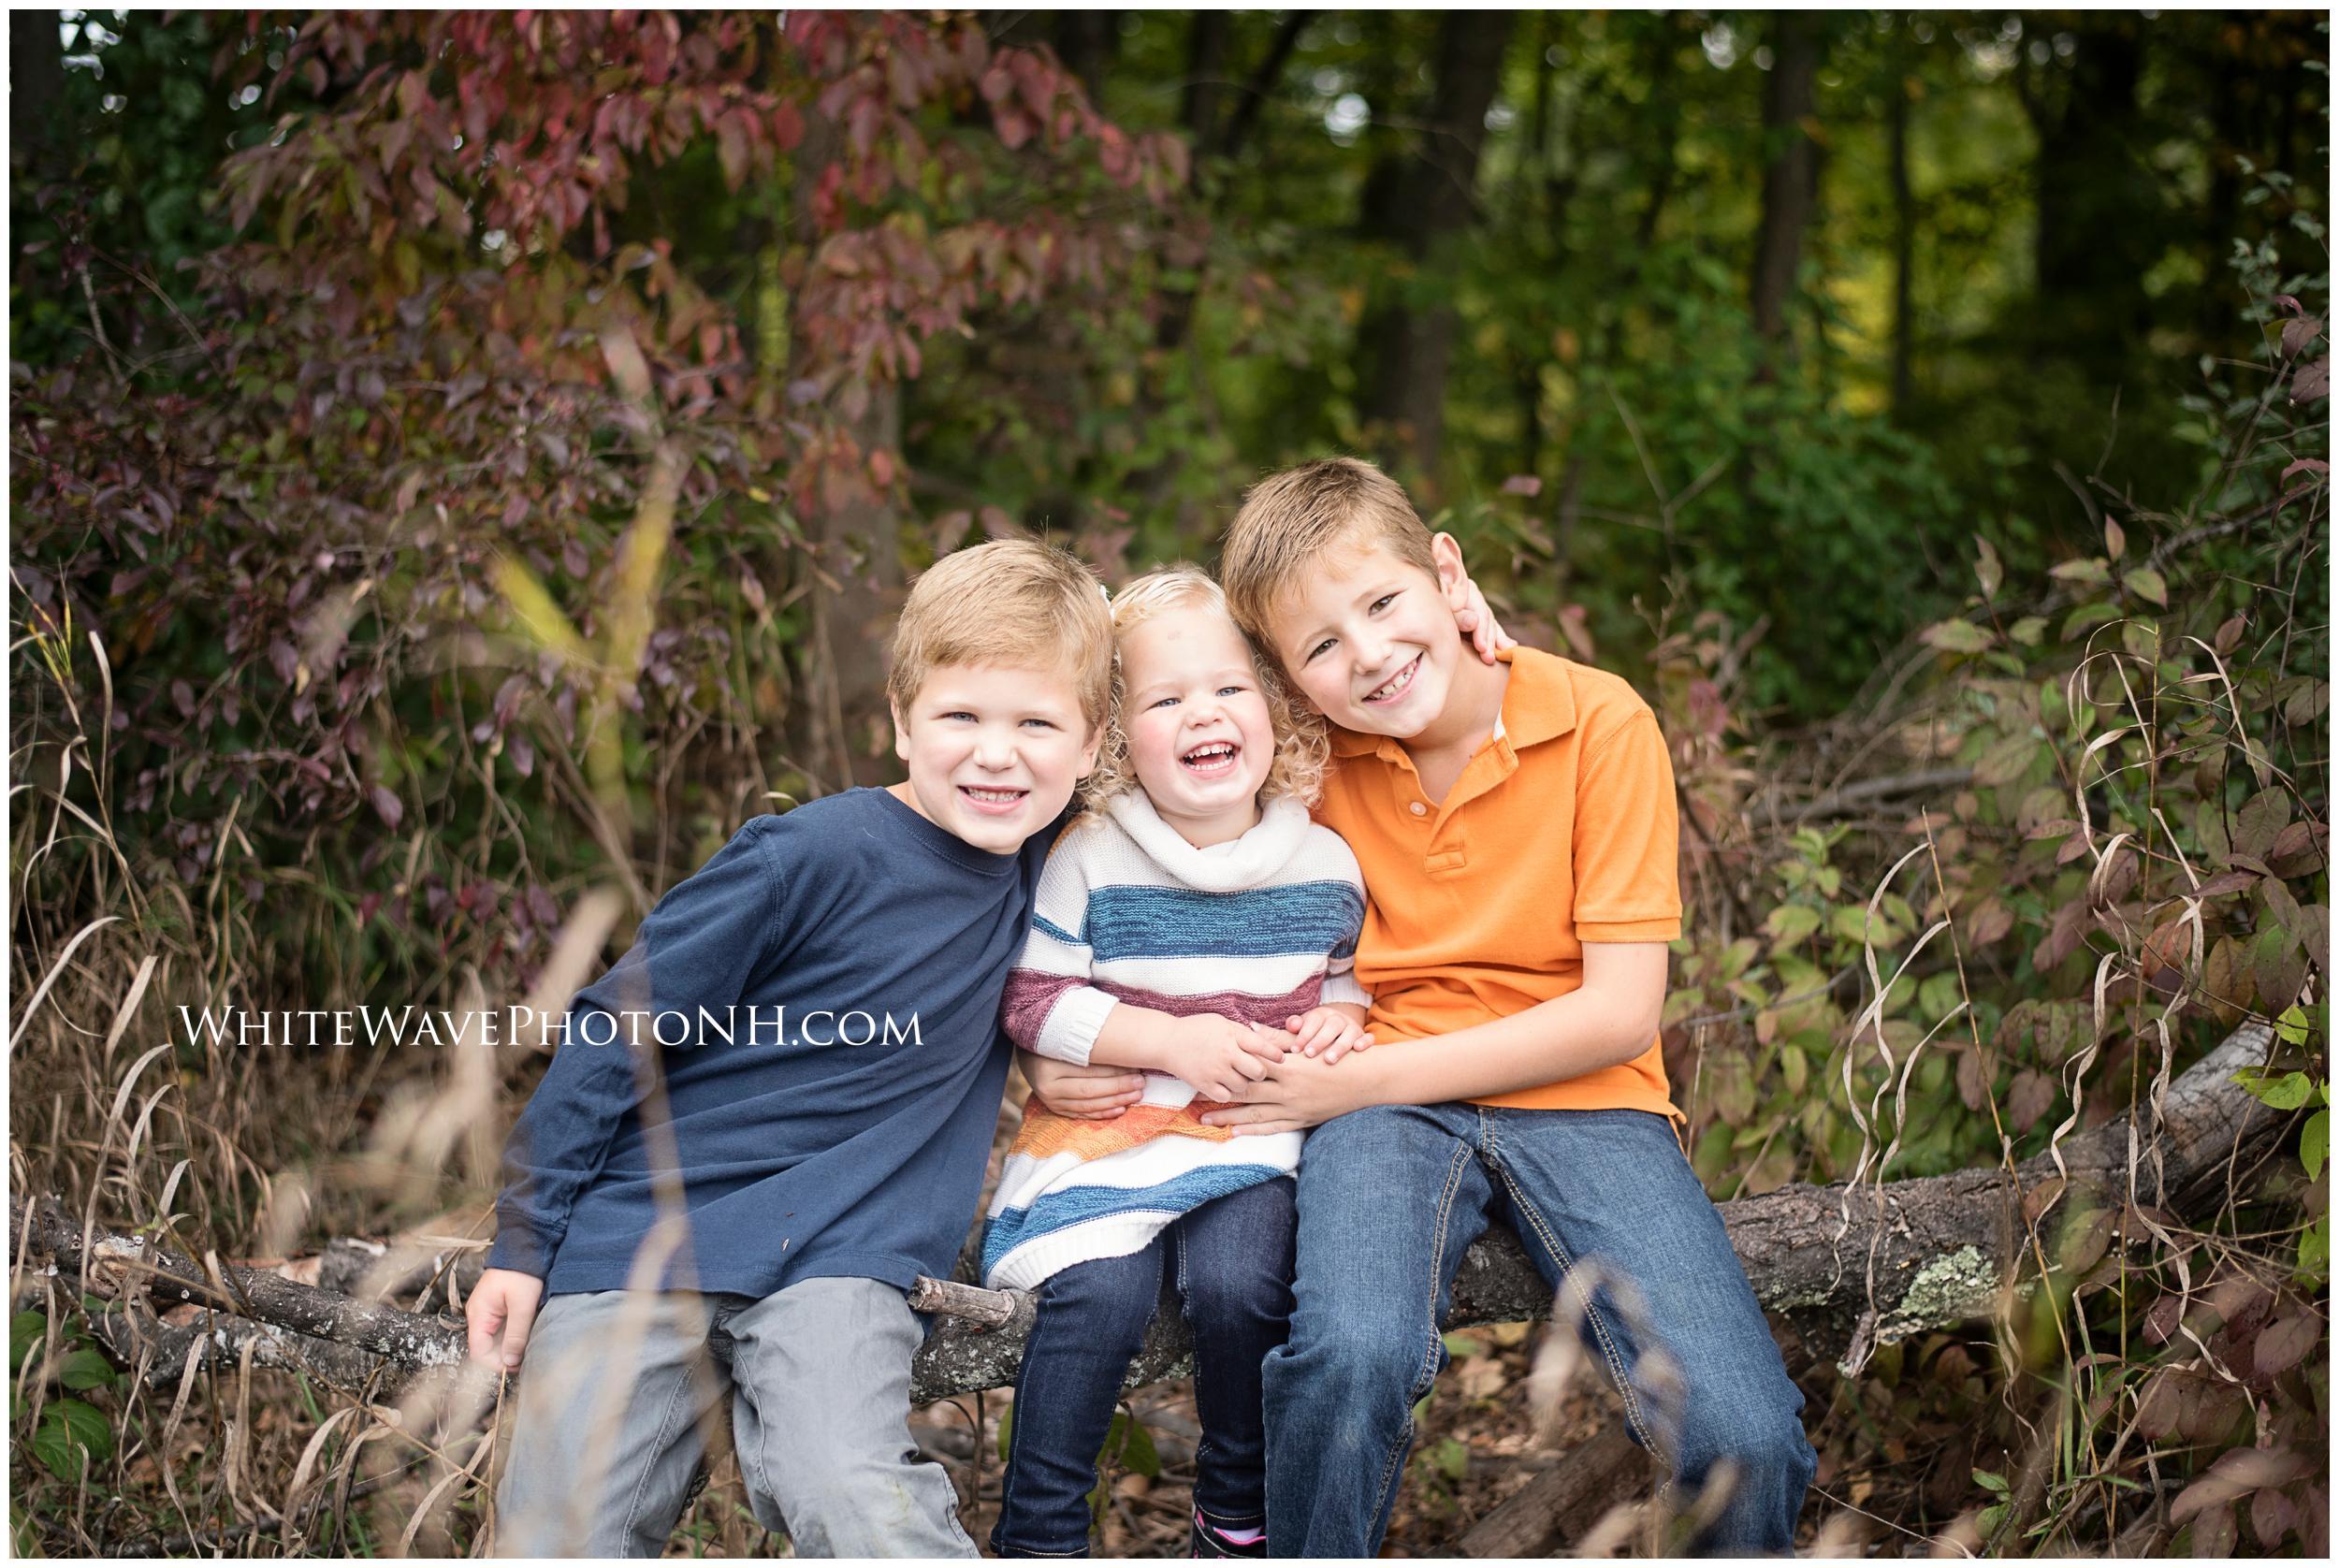 NH-Childrens-Photography-Fall-Foliage-2017_3084.jpg